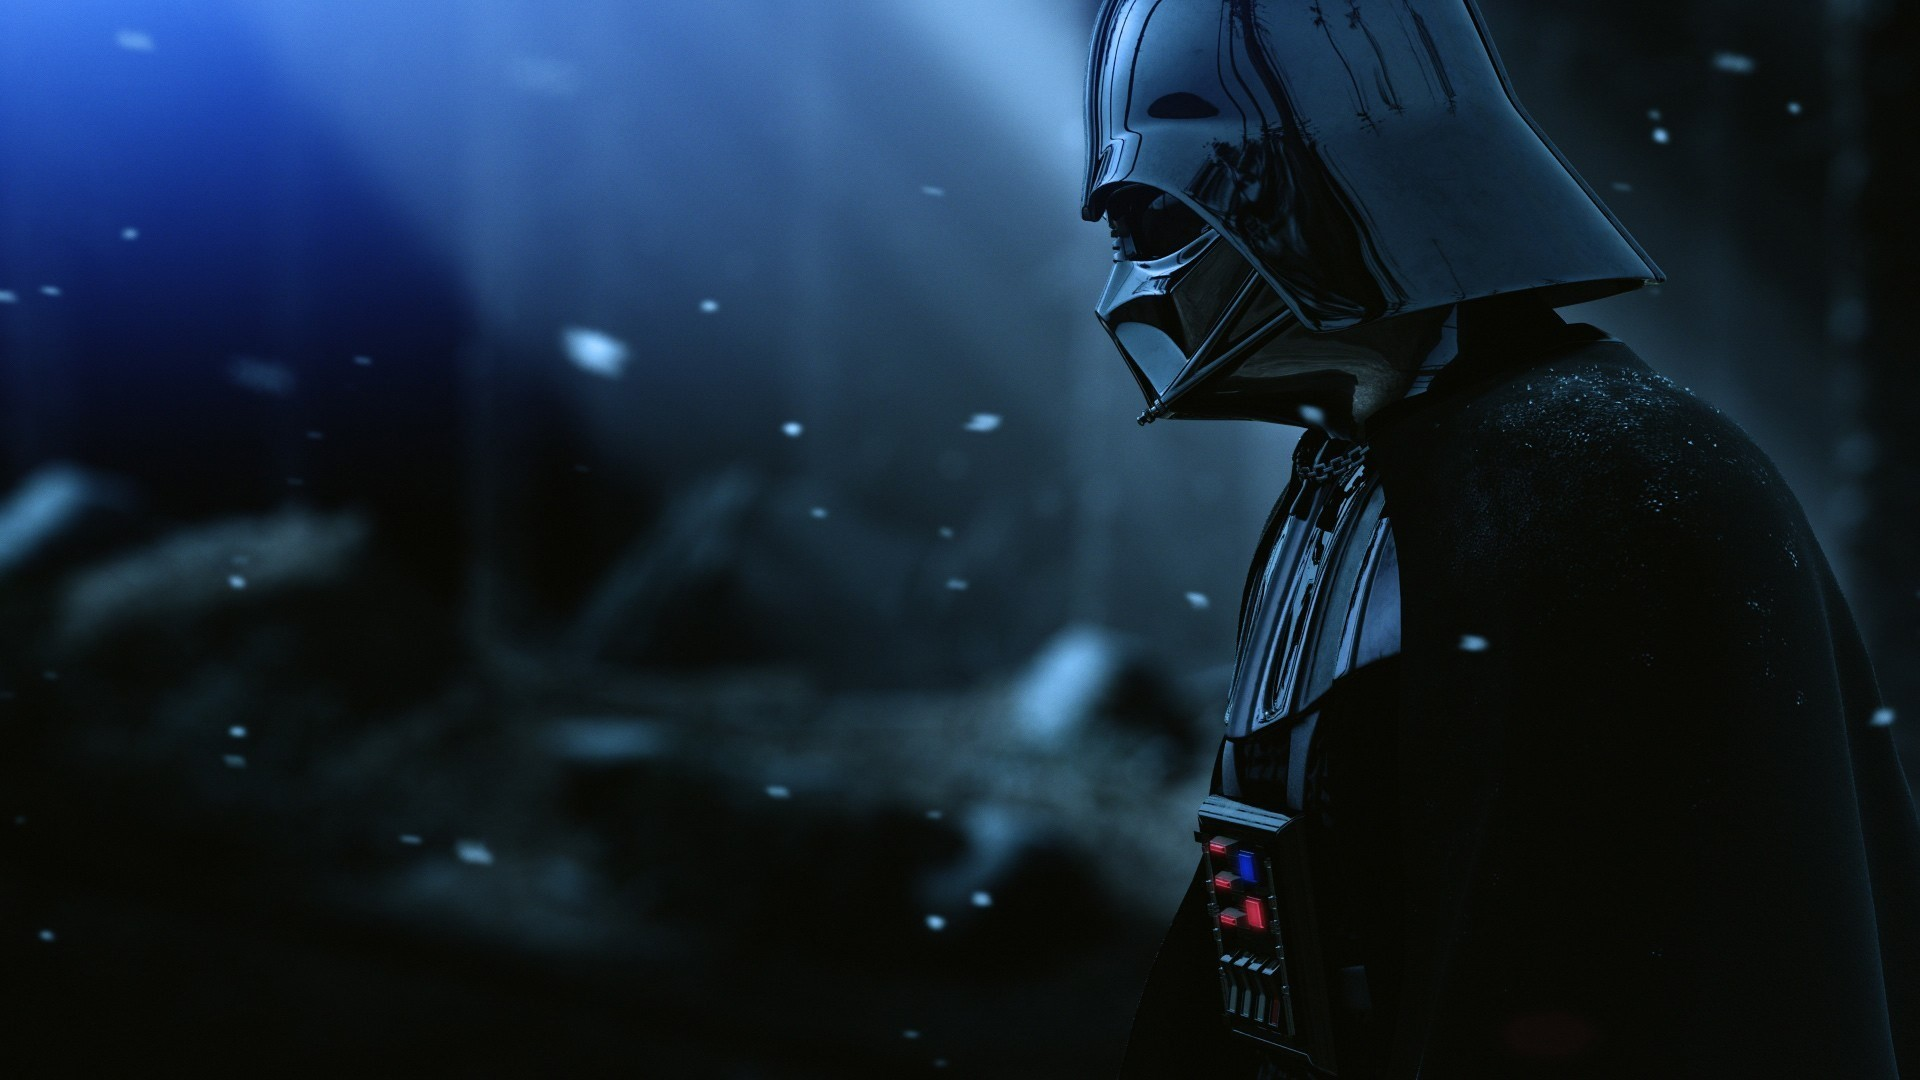 star wars hd wallpapers 1080p windows